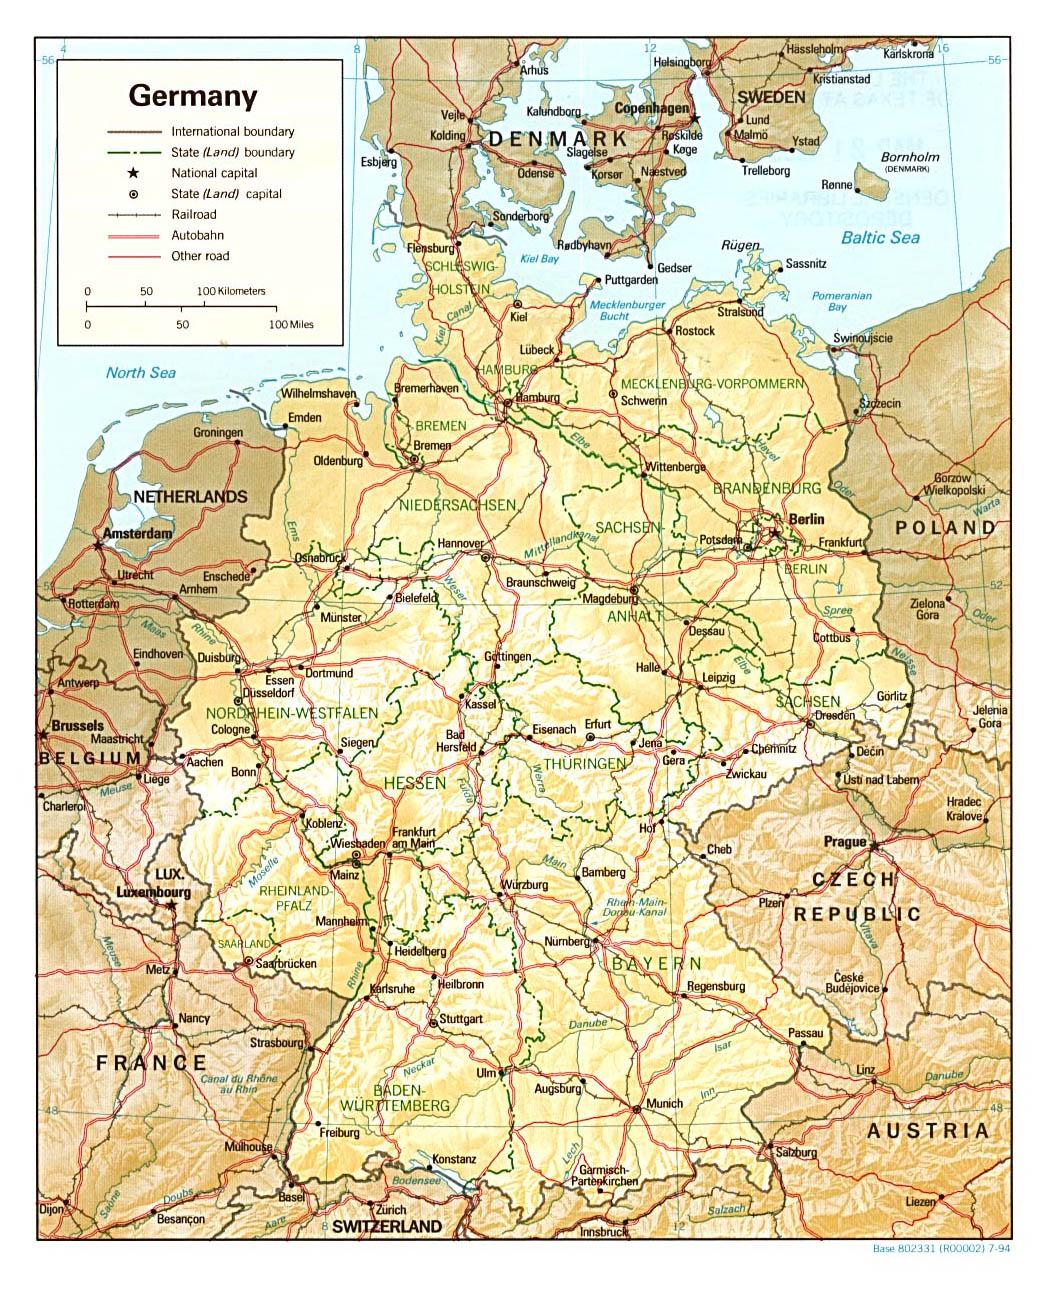 brewzavod - Blog: http://brewzavod907.weebly.com/